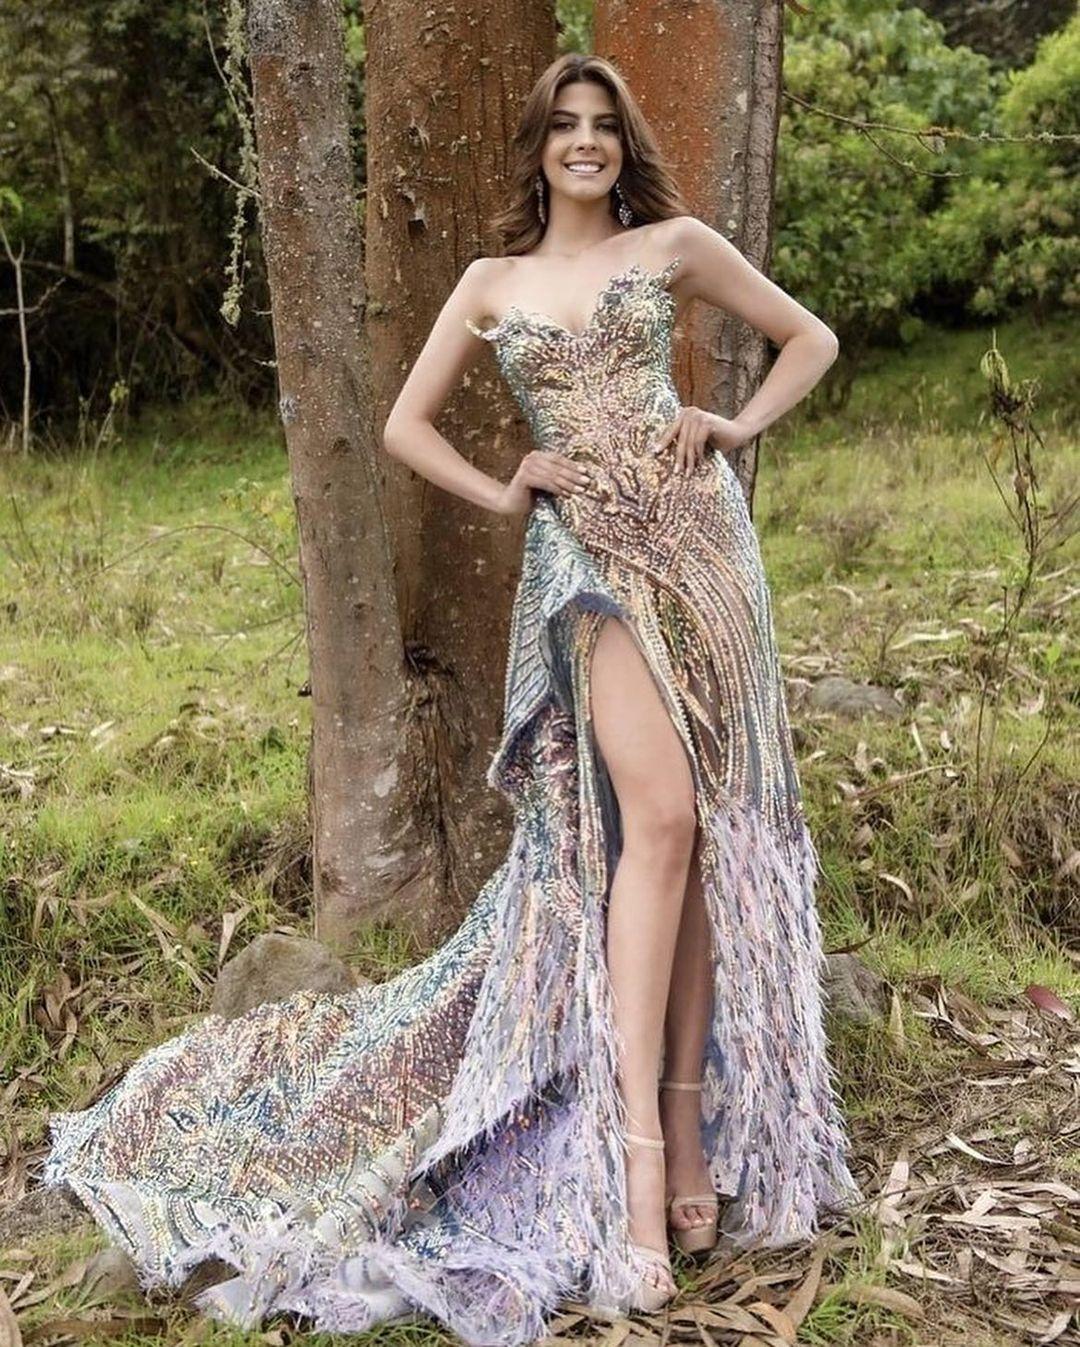 natalia manrique, miss grand colombia 2020. - Página 15 16369110